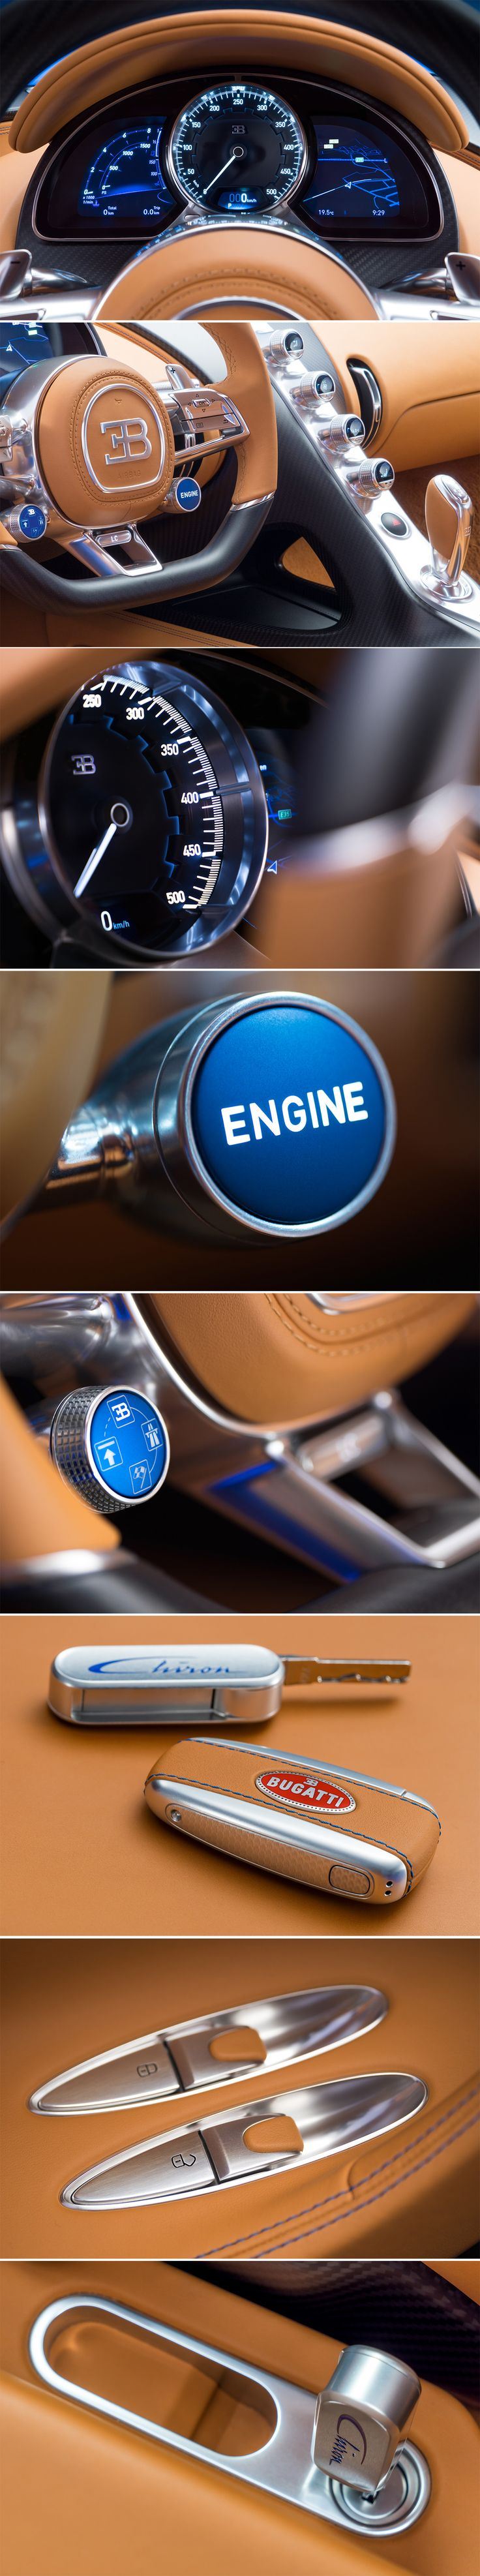 Bugatti Chiron, Interior Details                                                                                                                                                                                 Mais